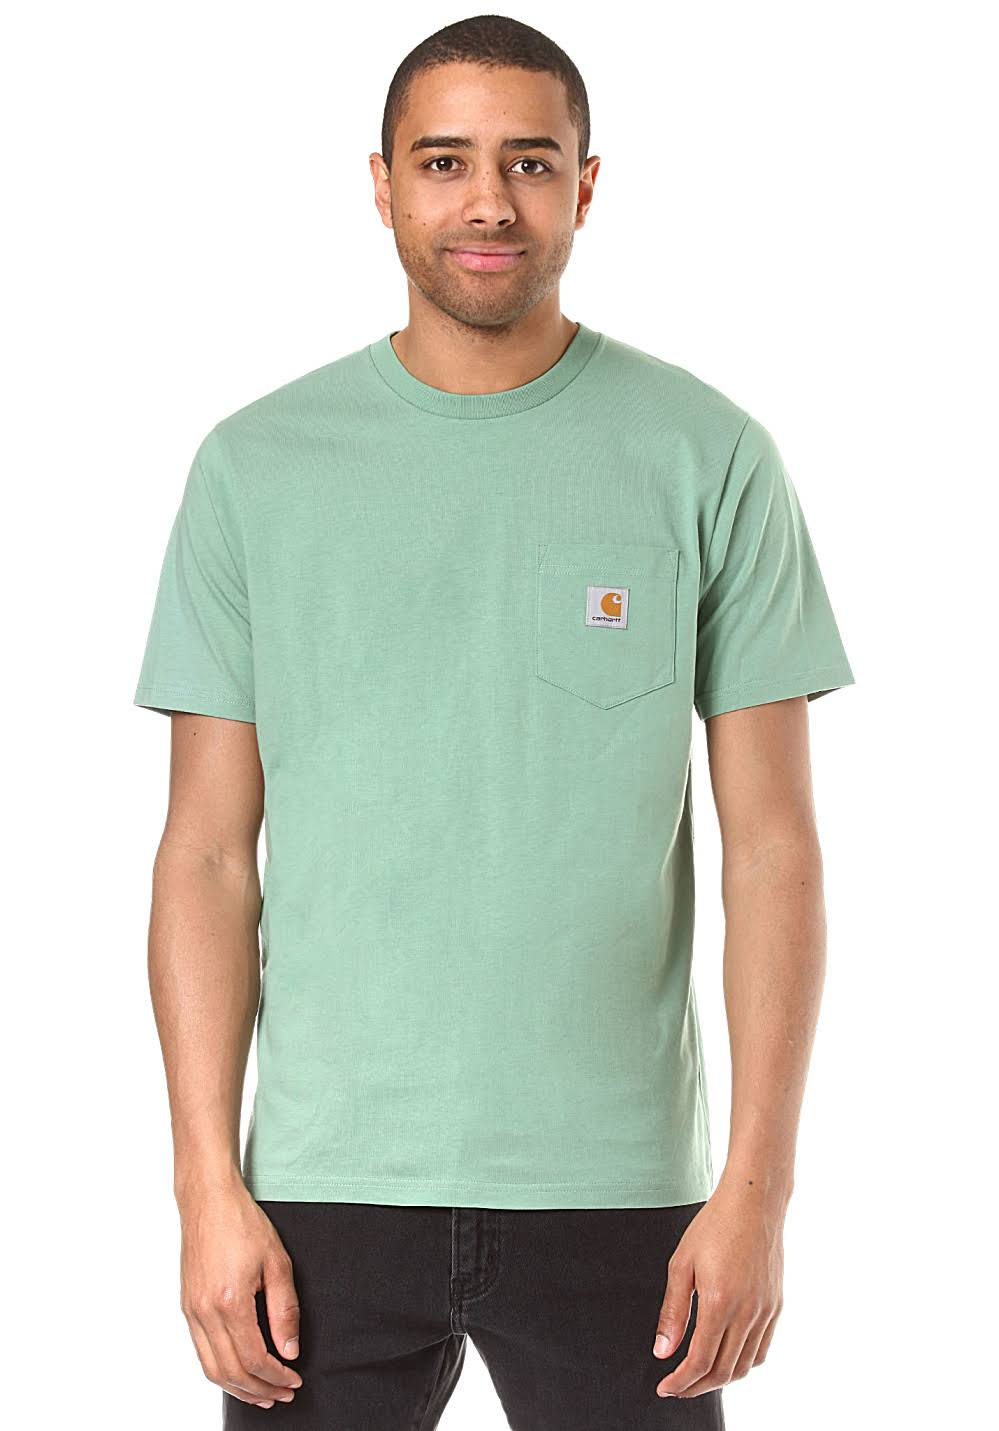 uomo Carhartt Wip verde shirt T TJKFl1c